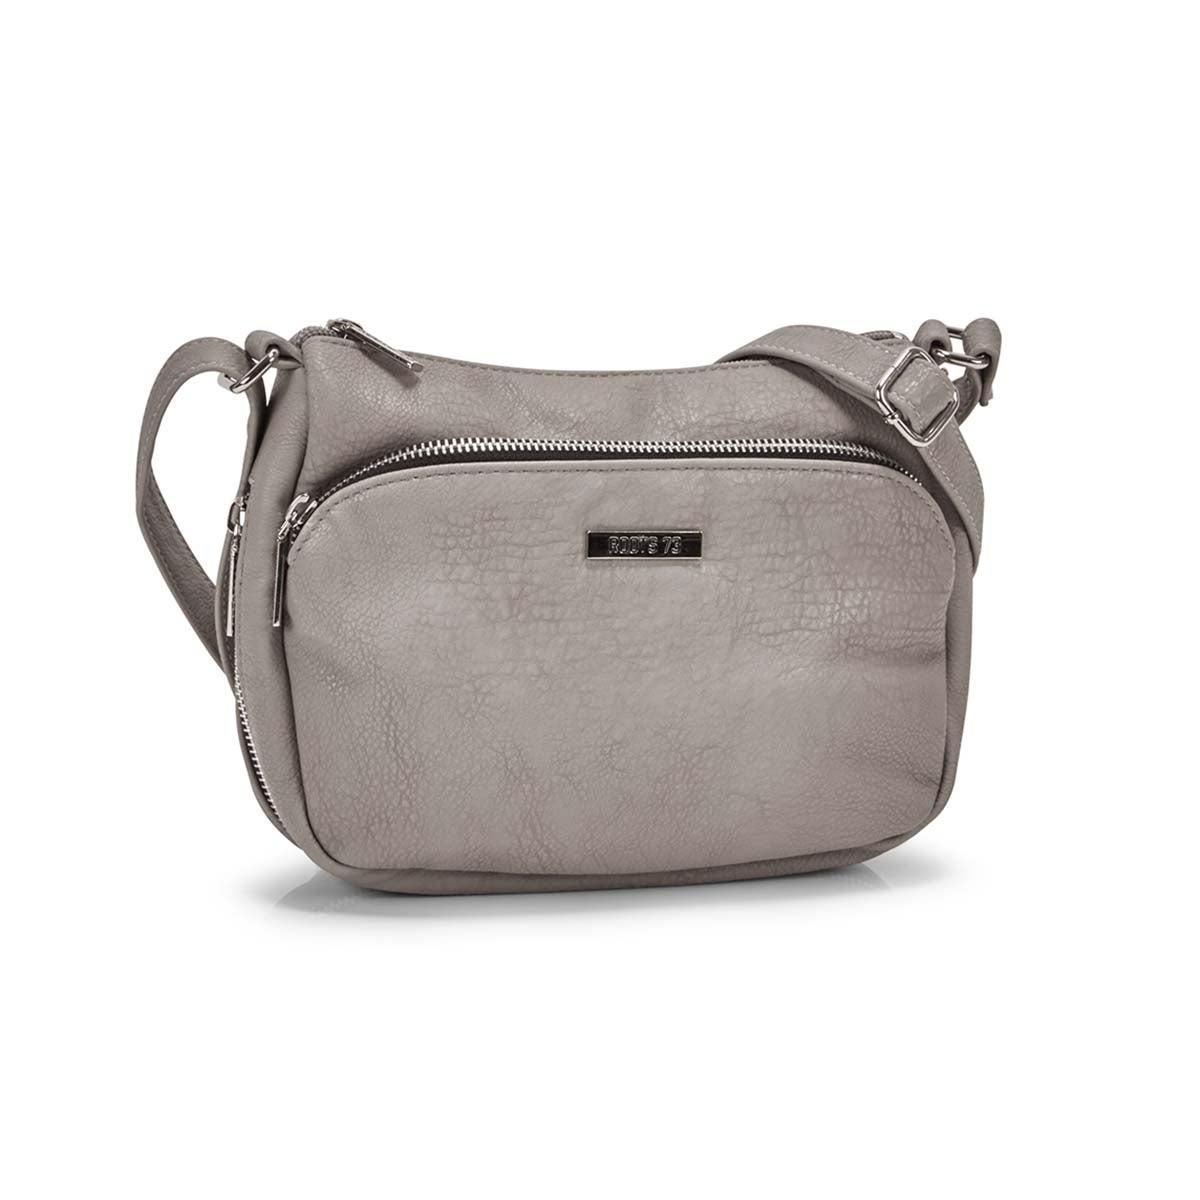 Women's R5209 grey crossbody bag